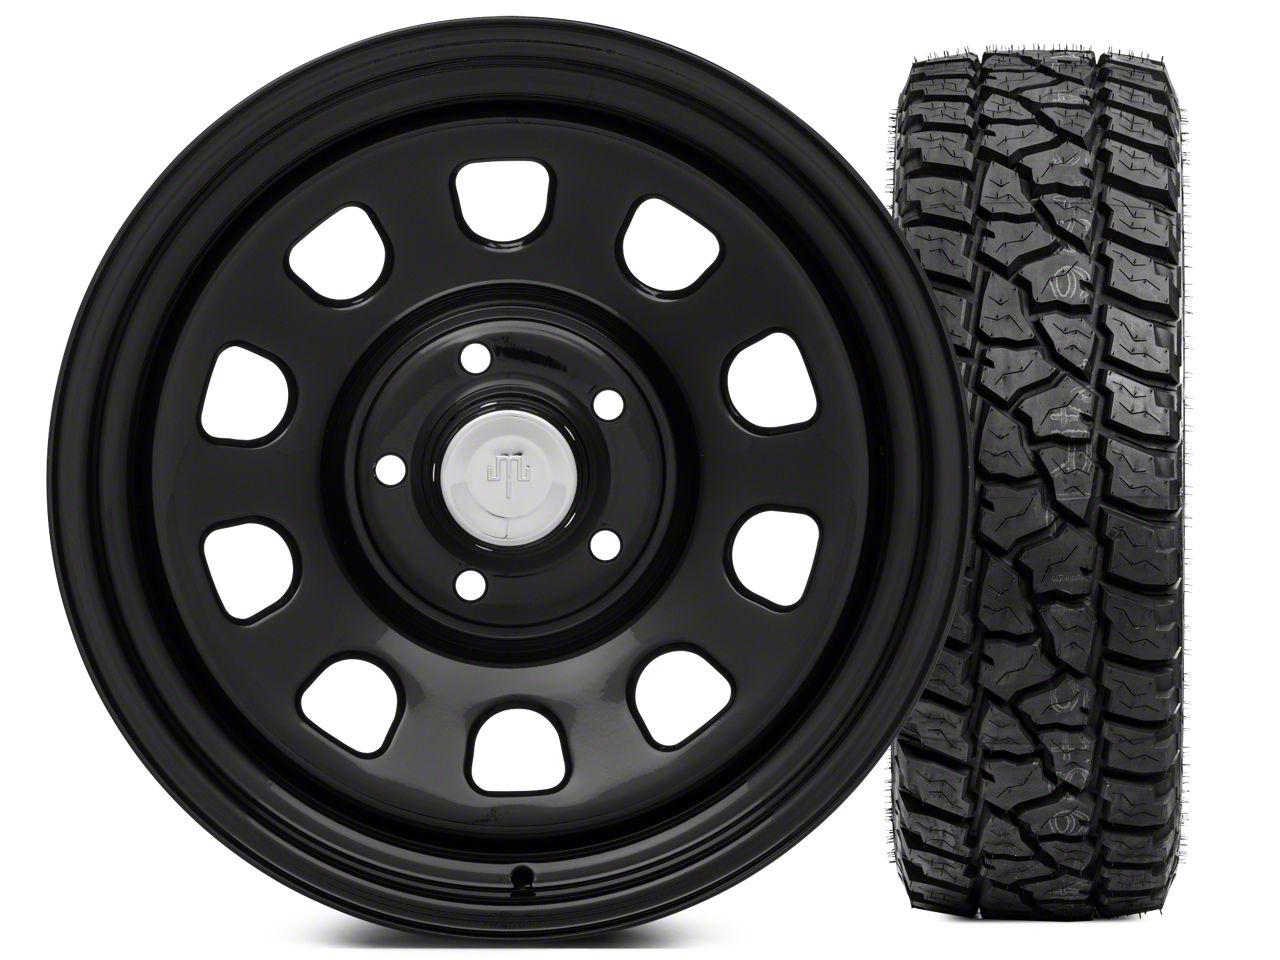 Mammoth D Window Steel 17x9 Wheel and Mickey Thompson Baja ATZP3 LT265/70R17 Tire Kit (07-18 Jeep Wrangler JK)